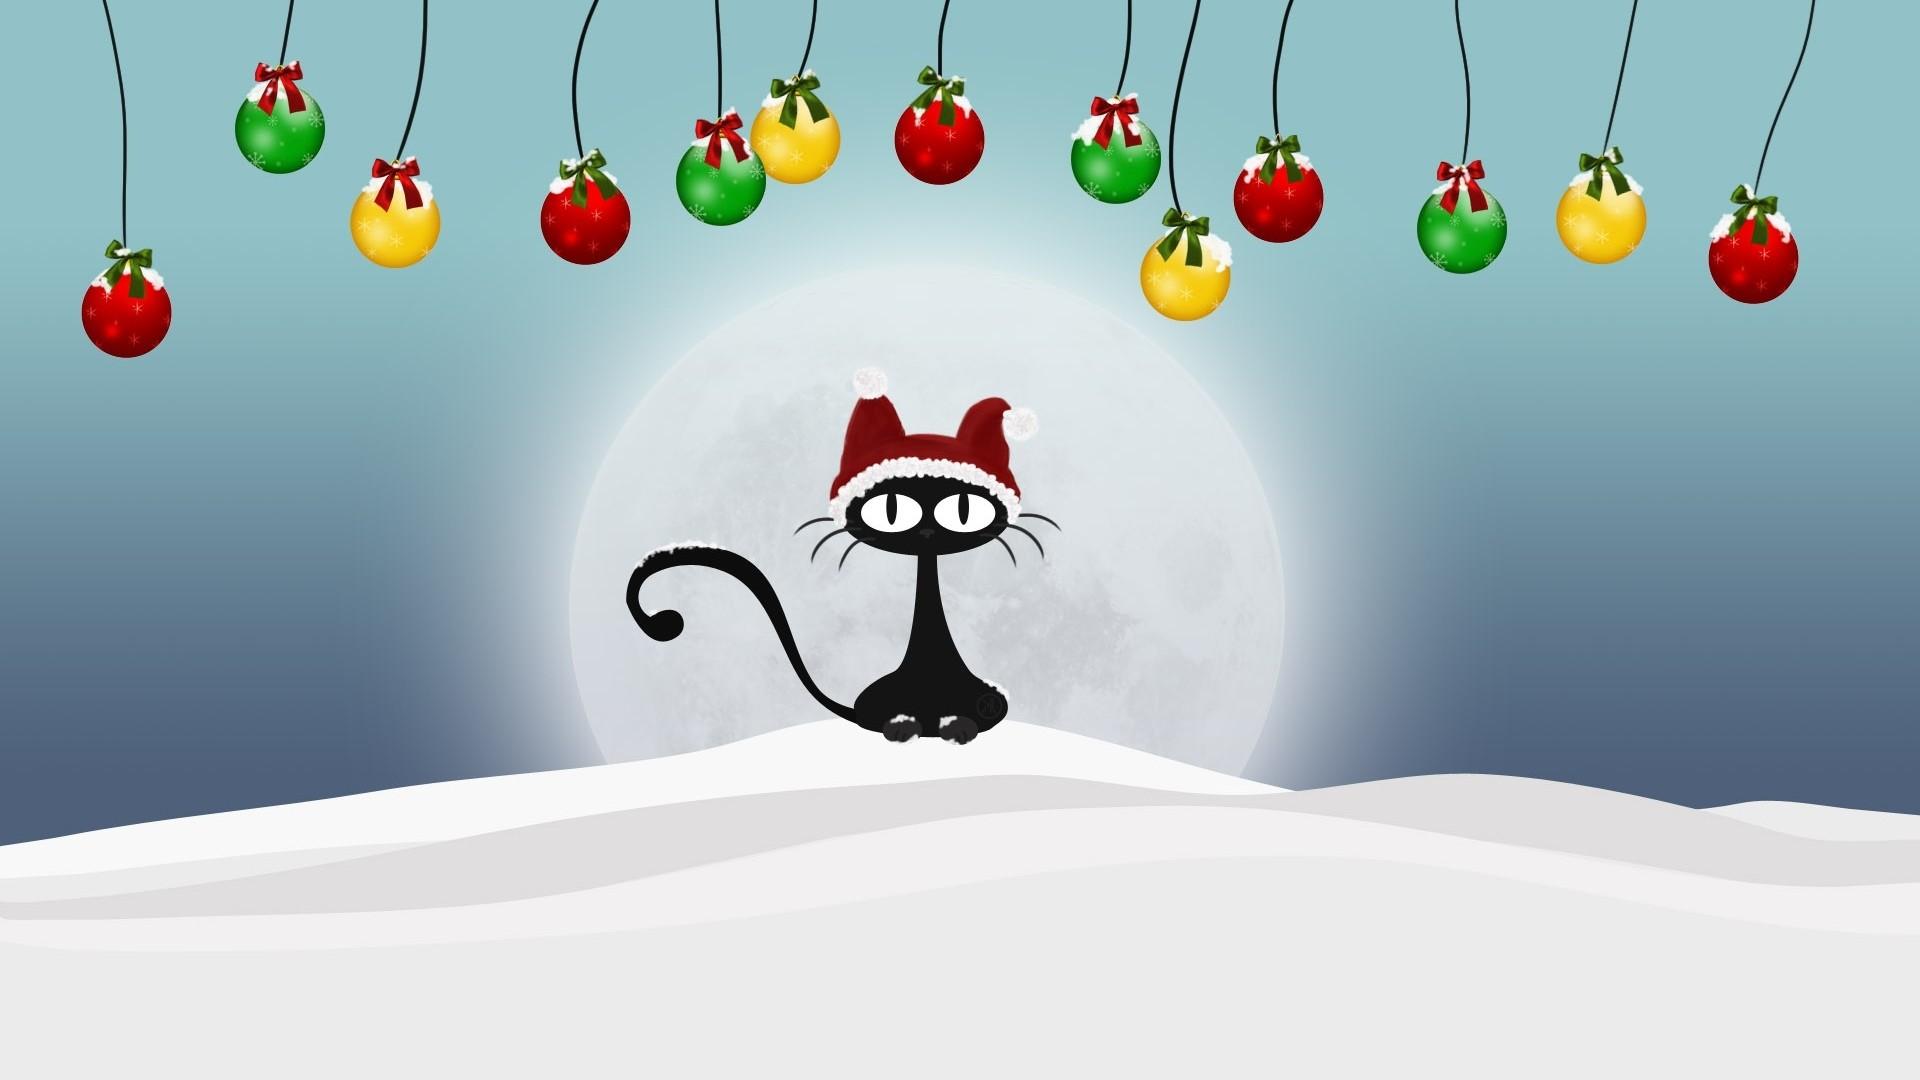 … funny christmas cat widescreen wallpaper wide wallpapers net …